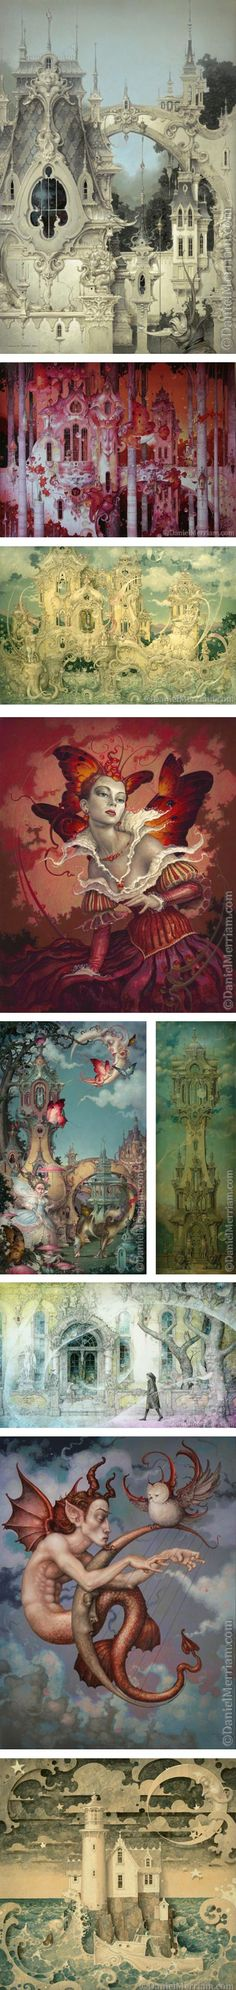 Daniel Merriam via Lines and Colors Fantasy World, Fantasy Art, Illustrations, Illustration Art, 3d Art, Surreal Art, Belle Photo, Oeuvre D'art, Painting & Drawing